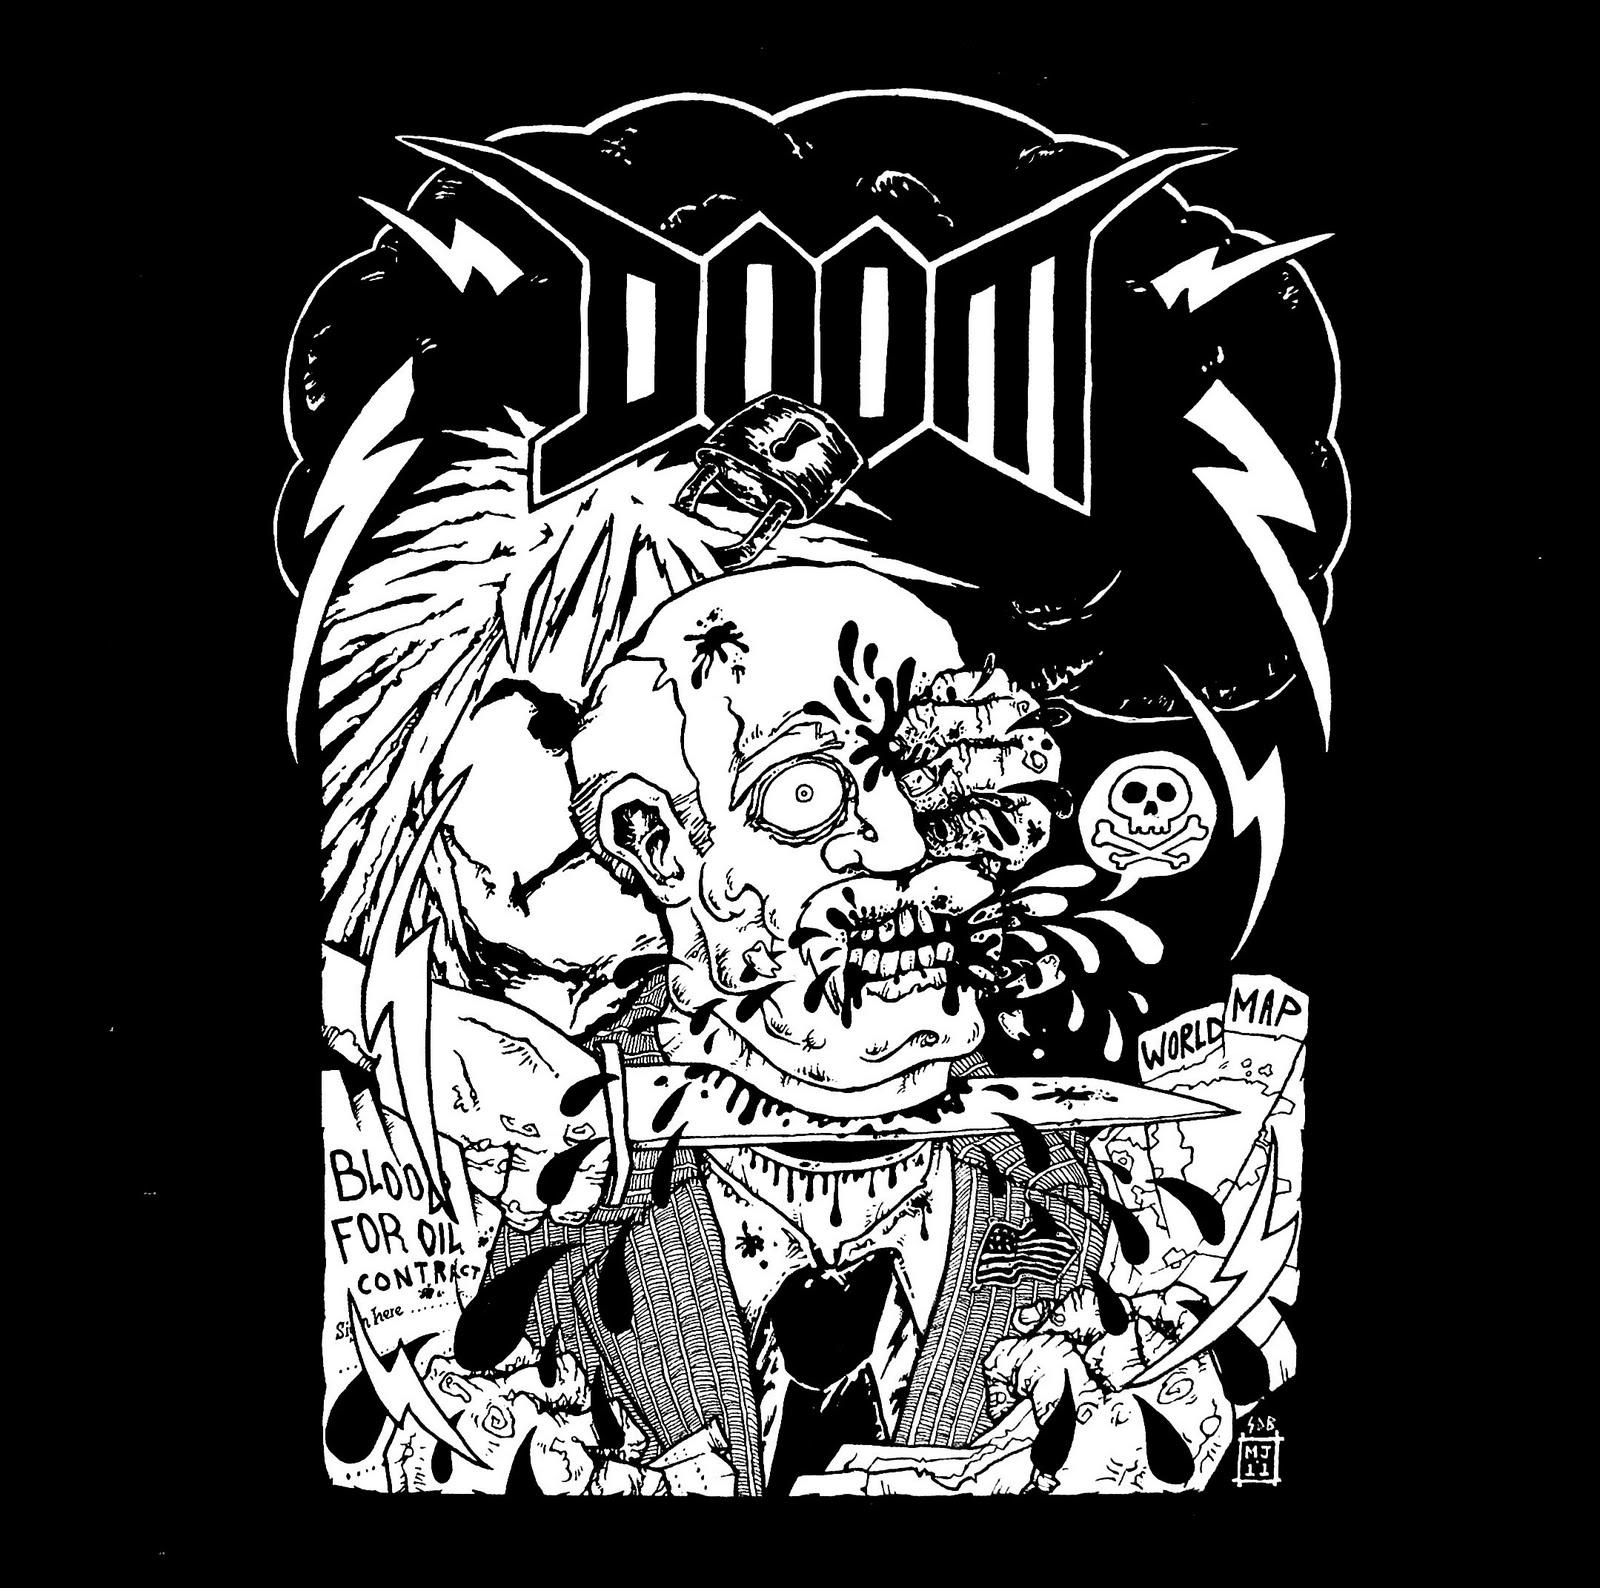 DOOM - Doom cover